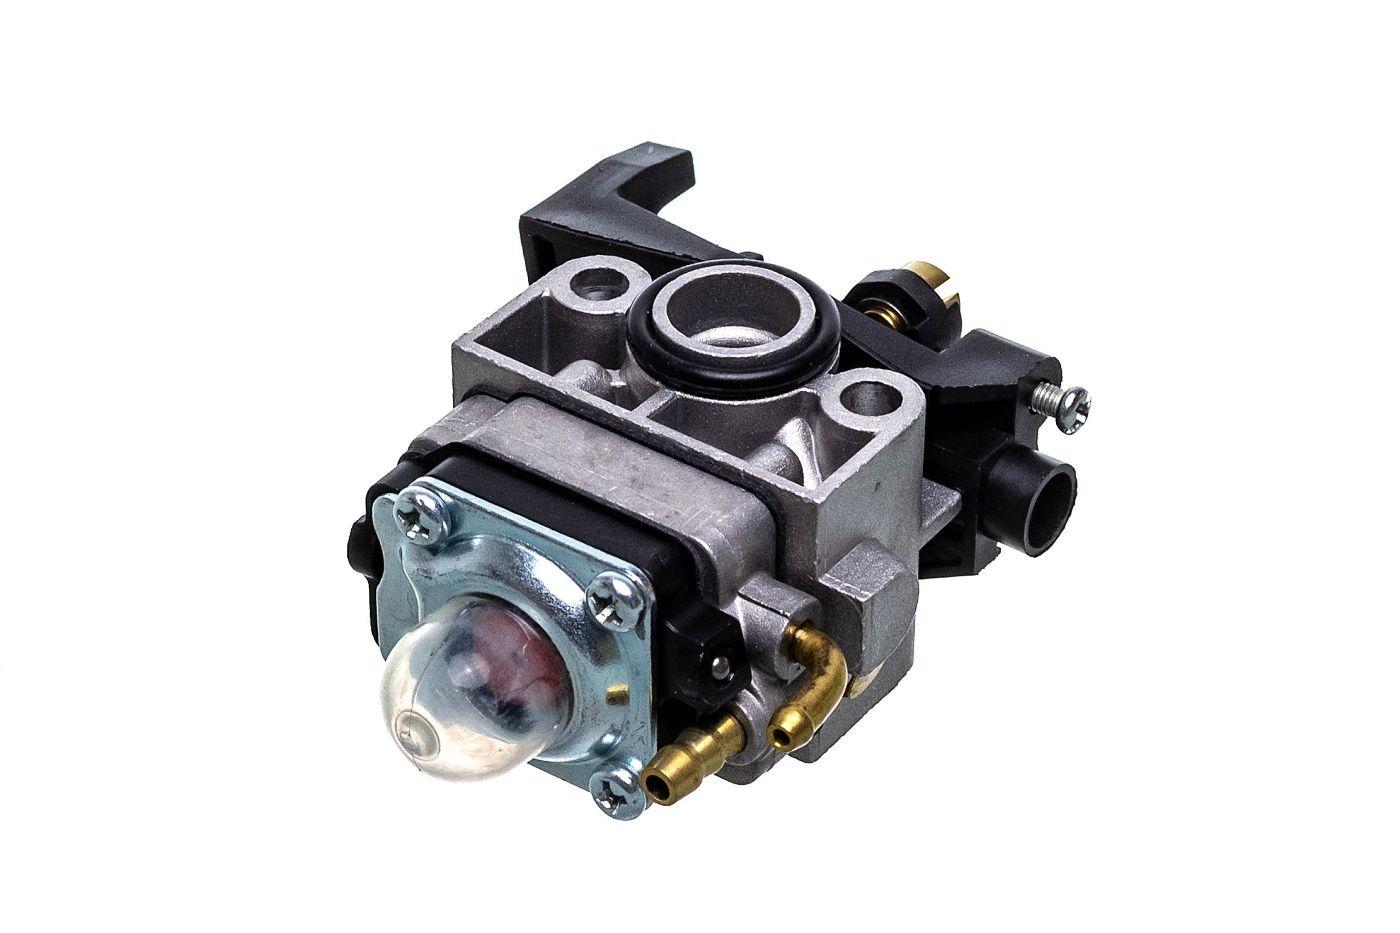 Karburátor Honda GX25, GX25N, GX25NT, FG110, 16100-Z0H-825 SUPER AKCIA